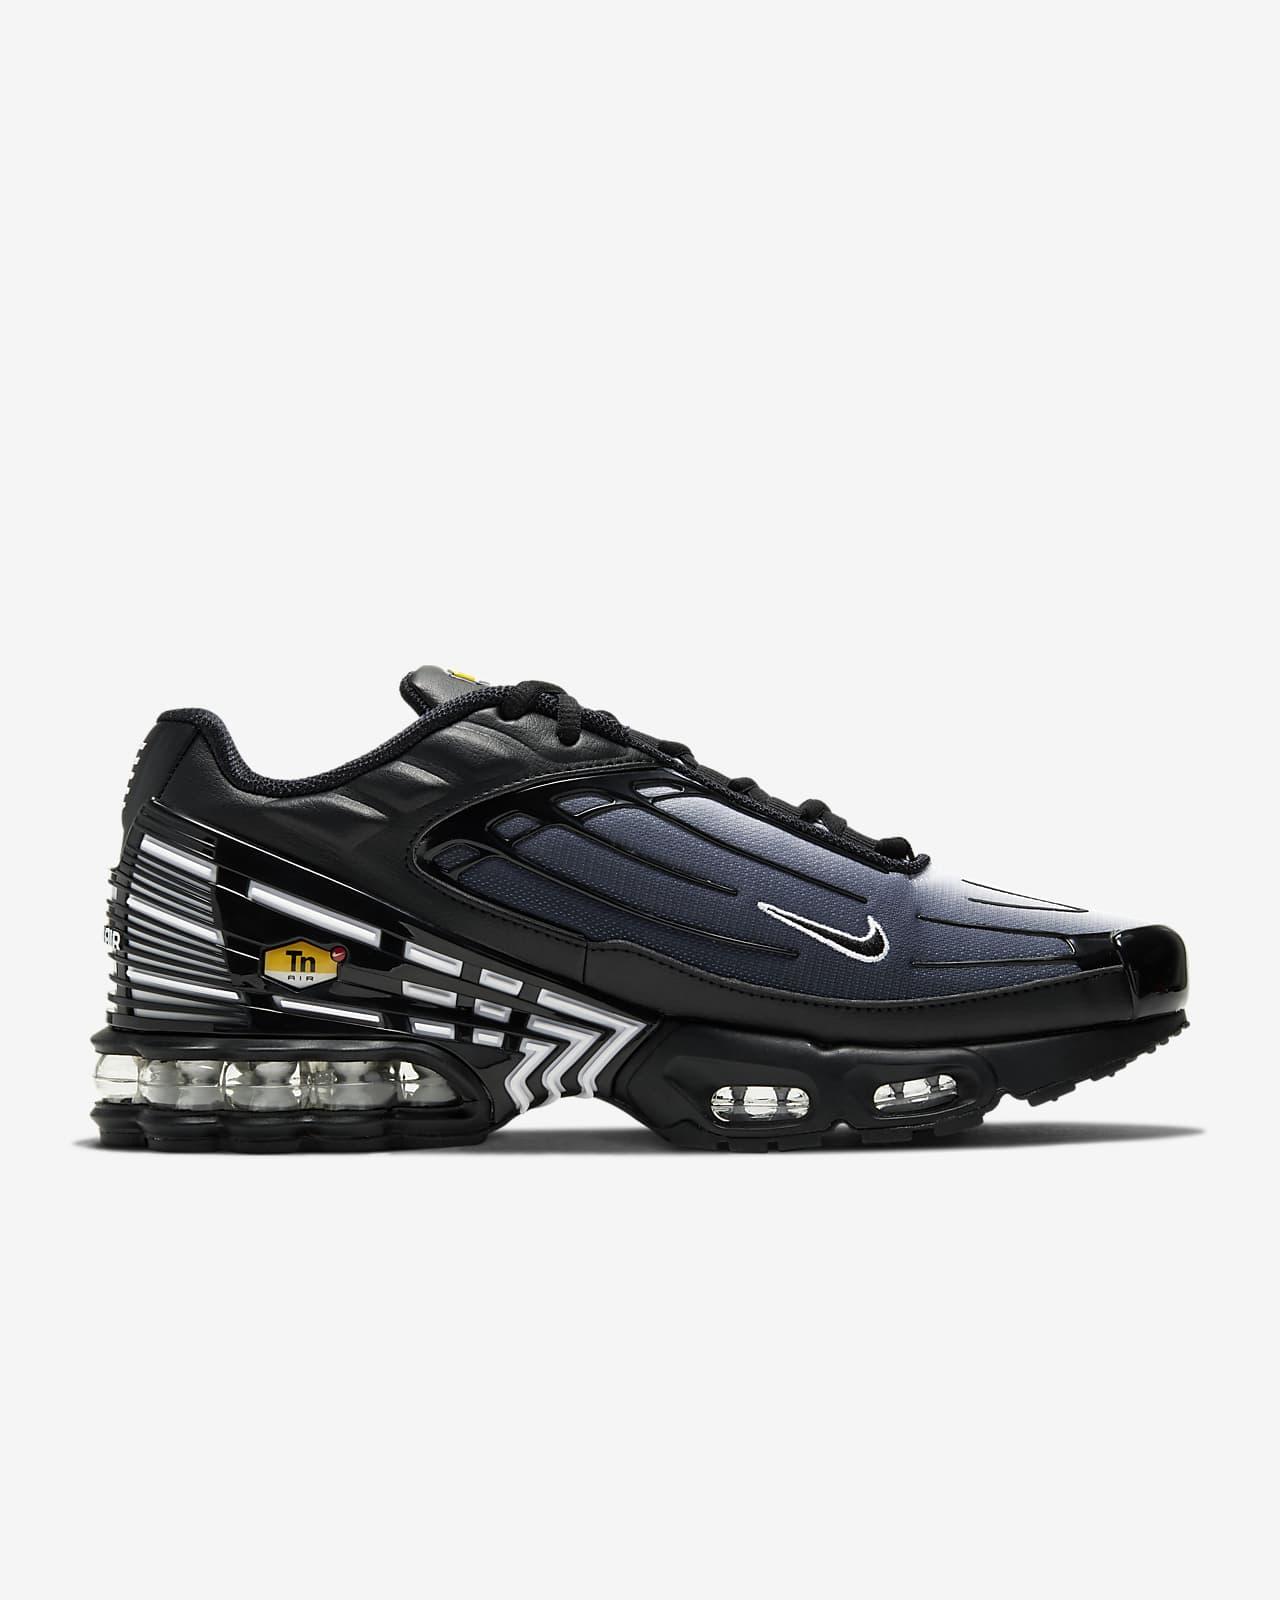 Chaussure Nike Air Max Plus III pour Homme. Nike LU